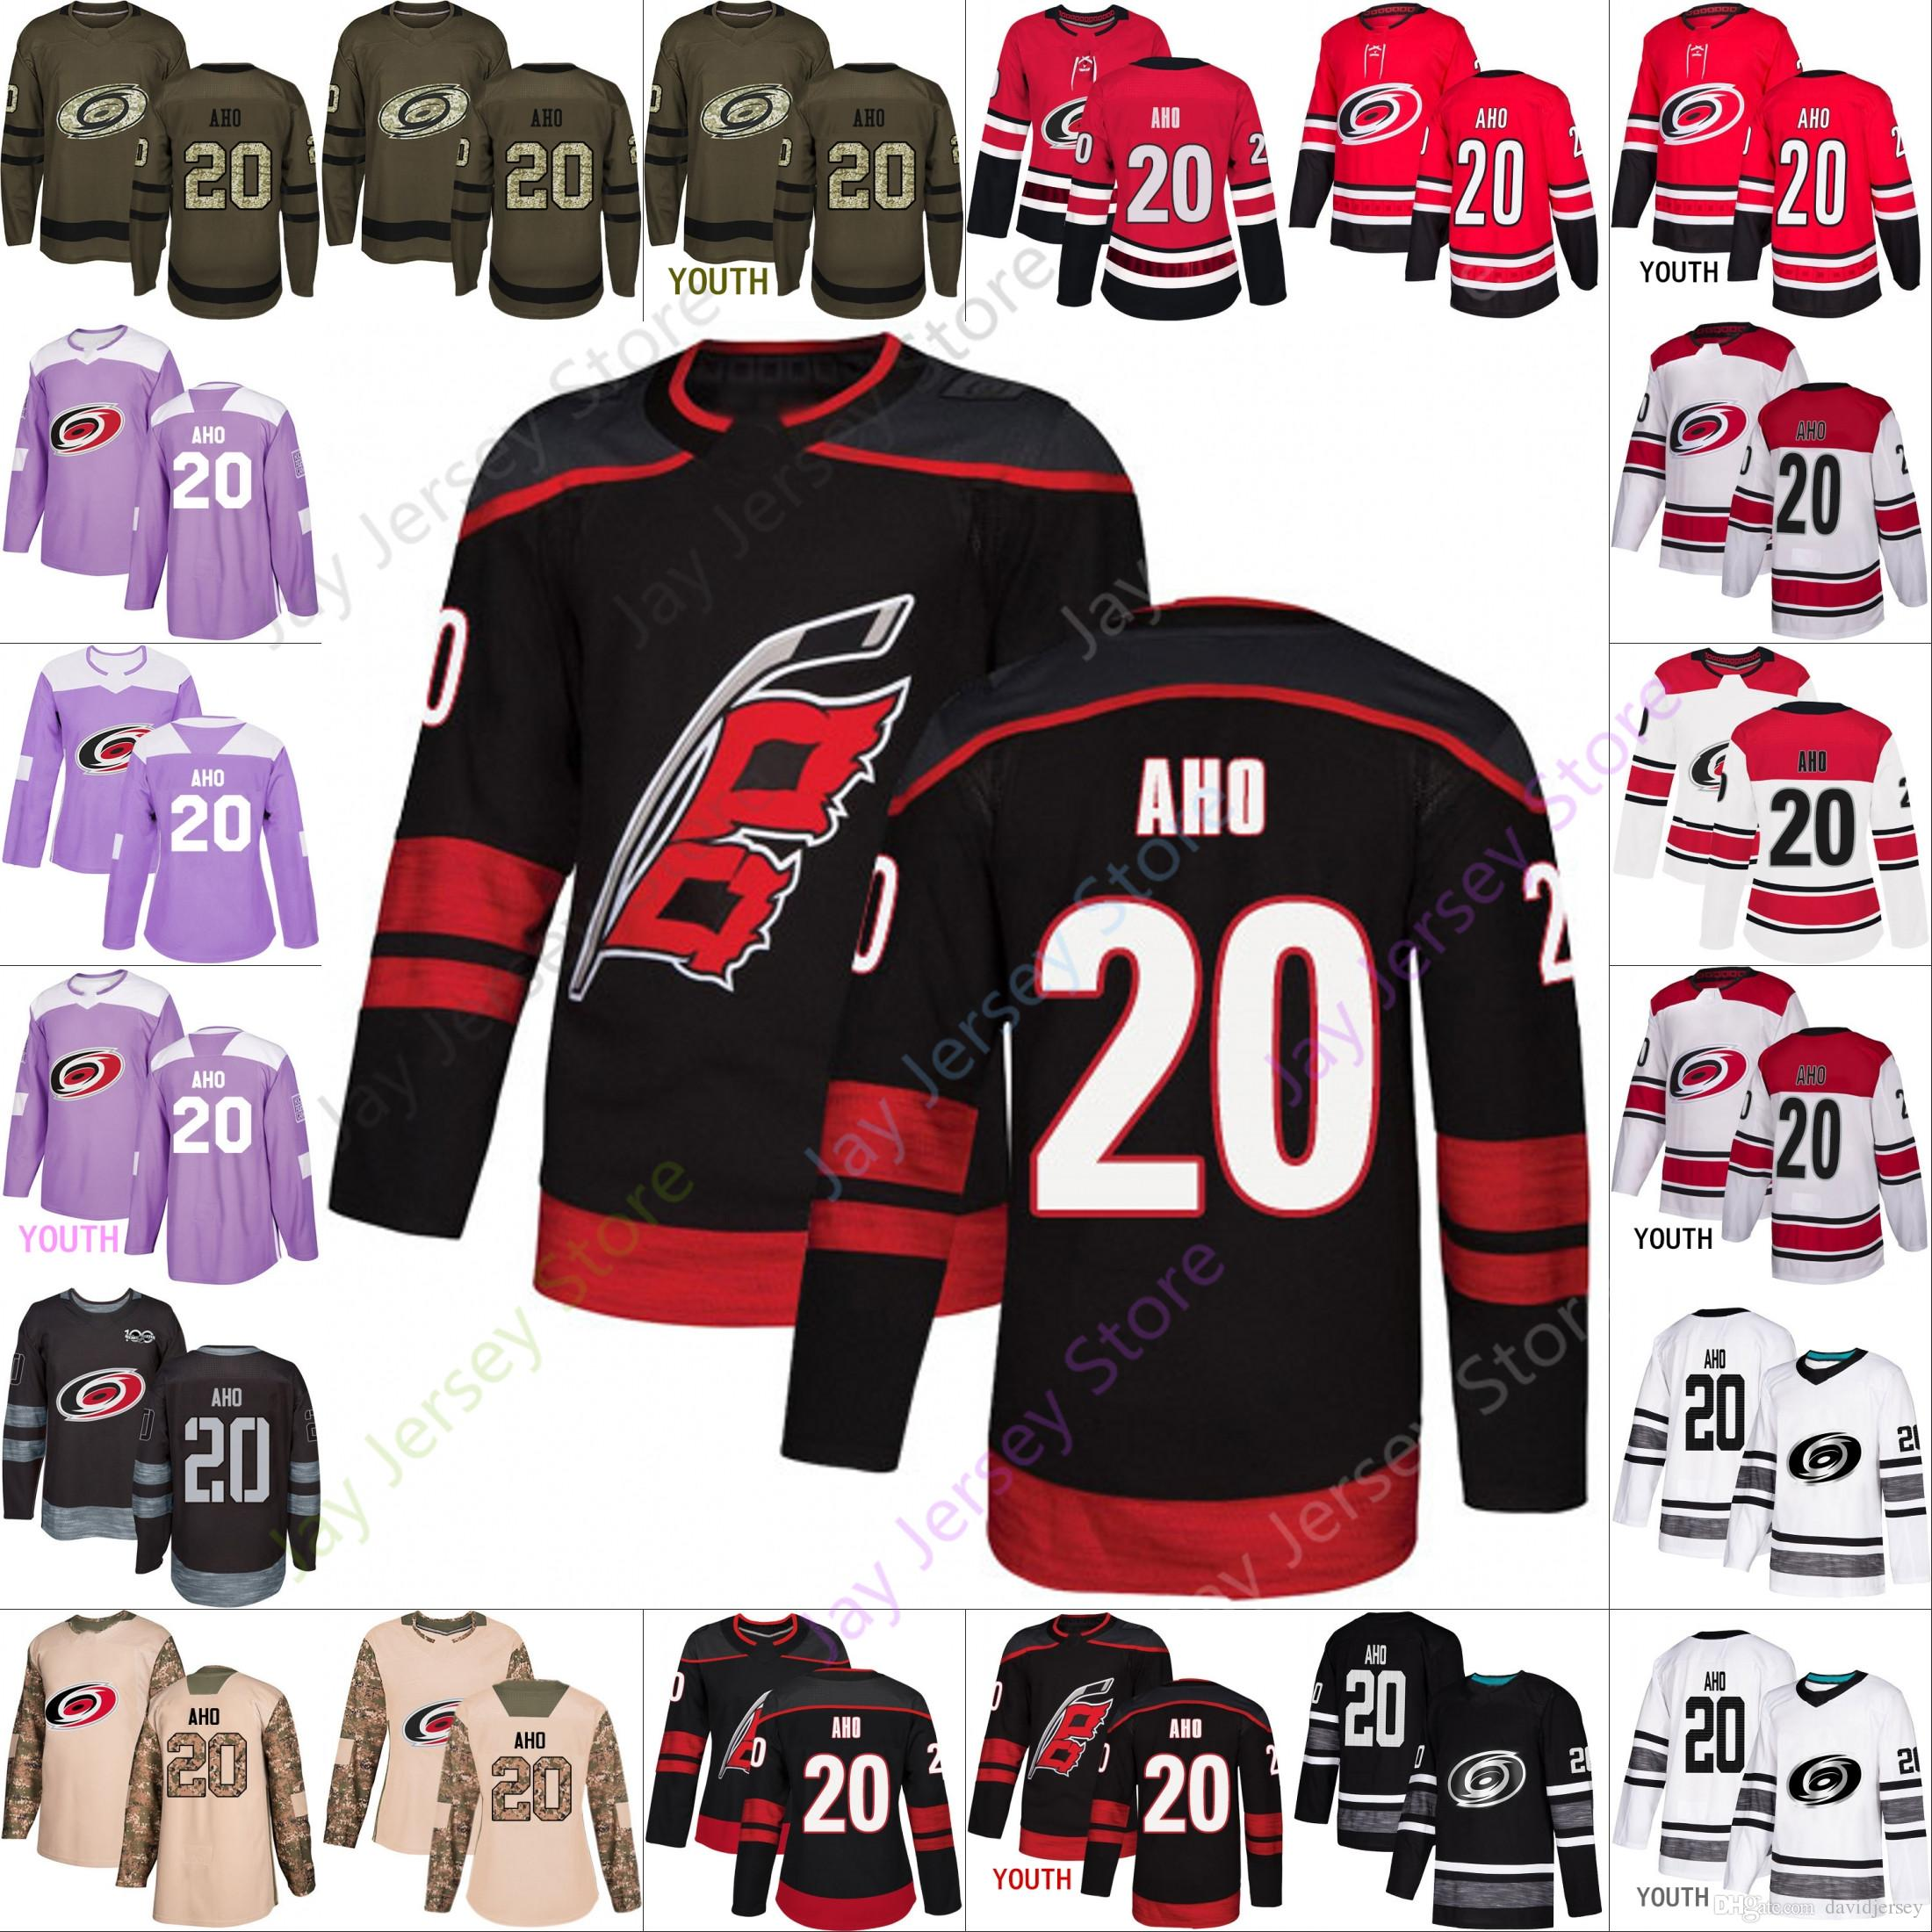 quality design eb56a 1c66e Carolina Hurricanes 20 Sebastian Aho Jersey Authentic 2019 Fashion Stadium  Series Jerseys Men Women Youth Kid Cheap